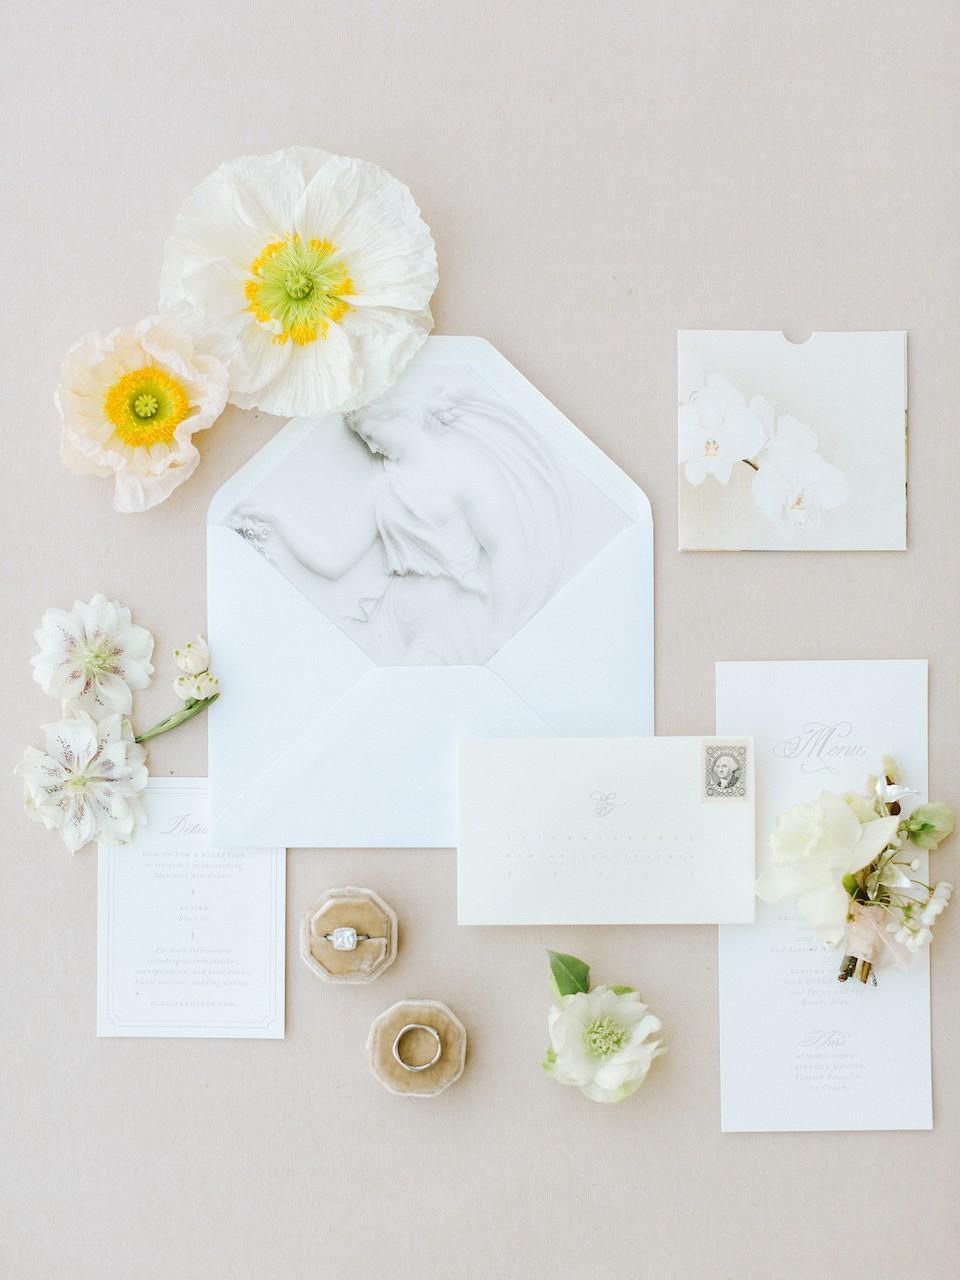 Tranquil yet Modern White Wedding Ideas